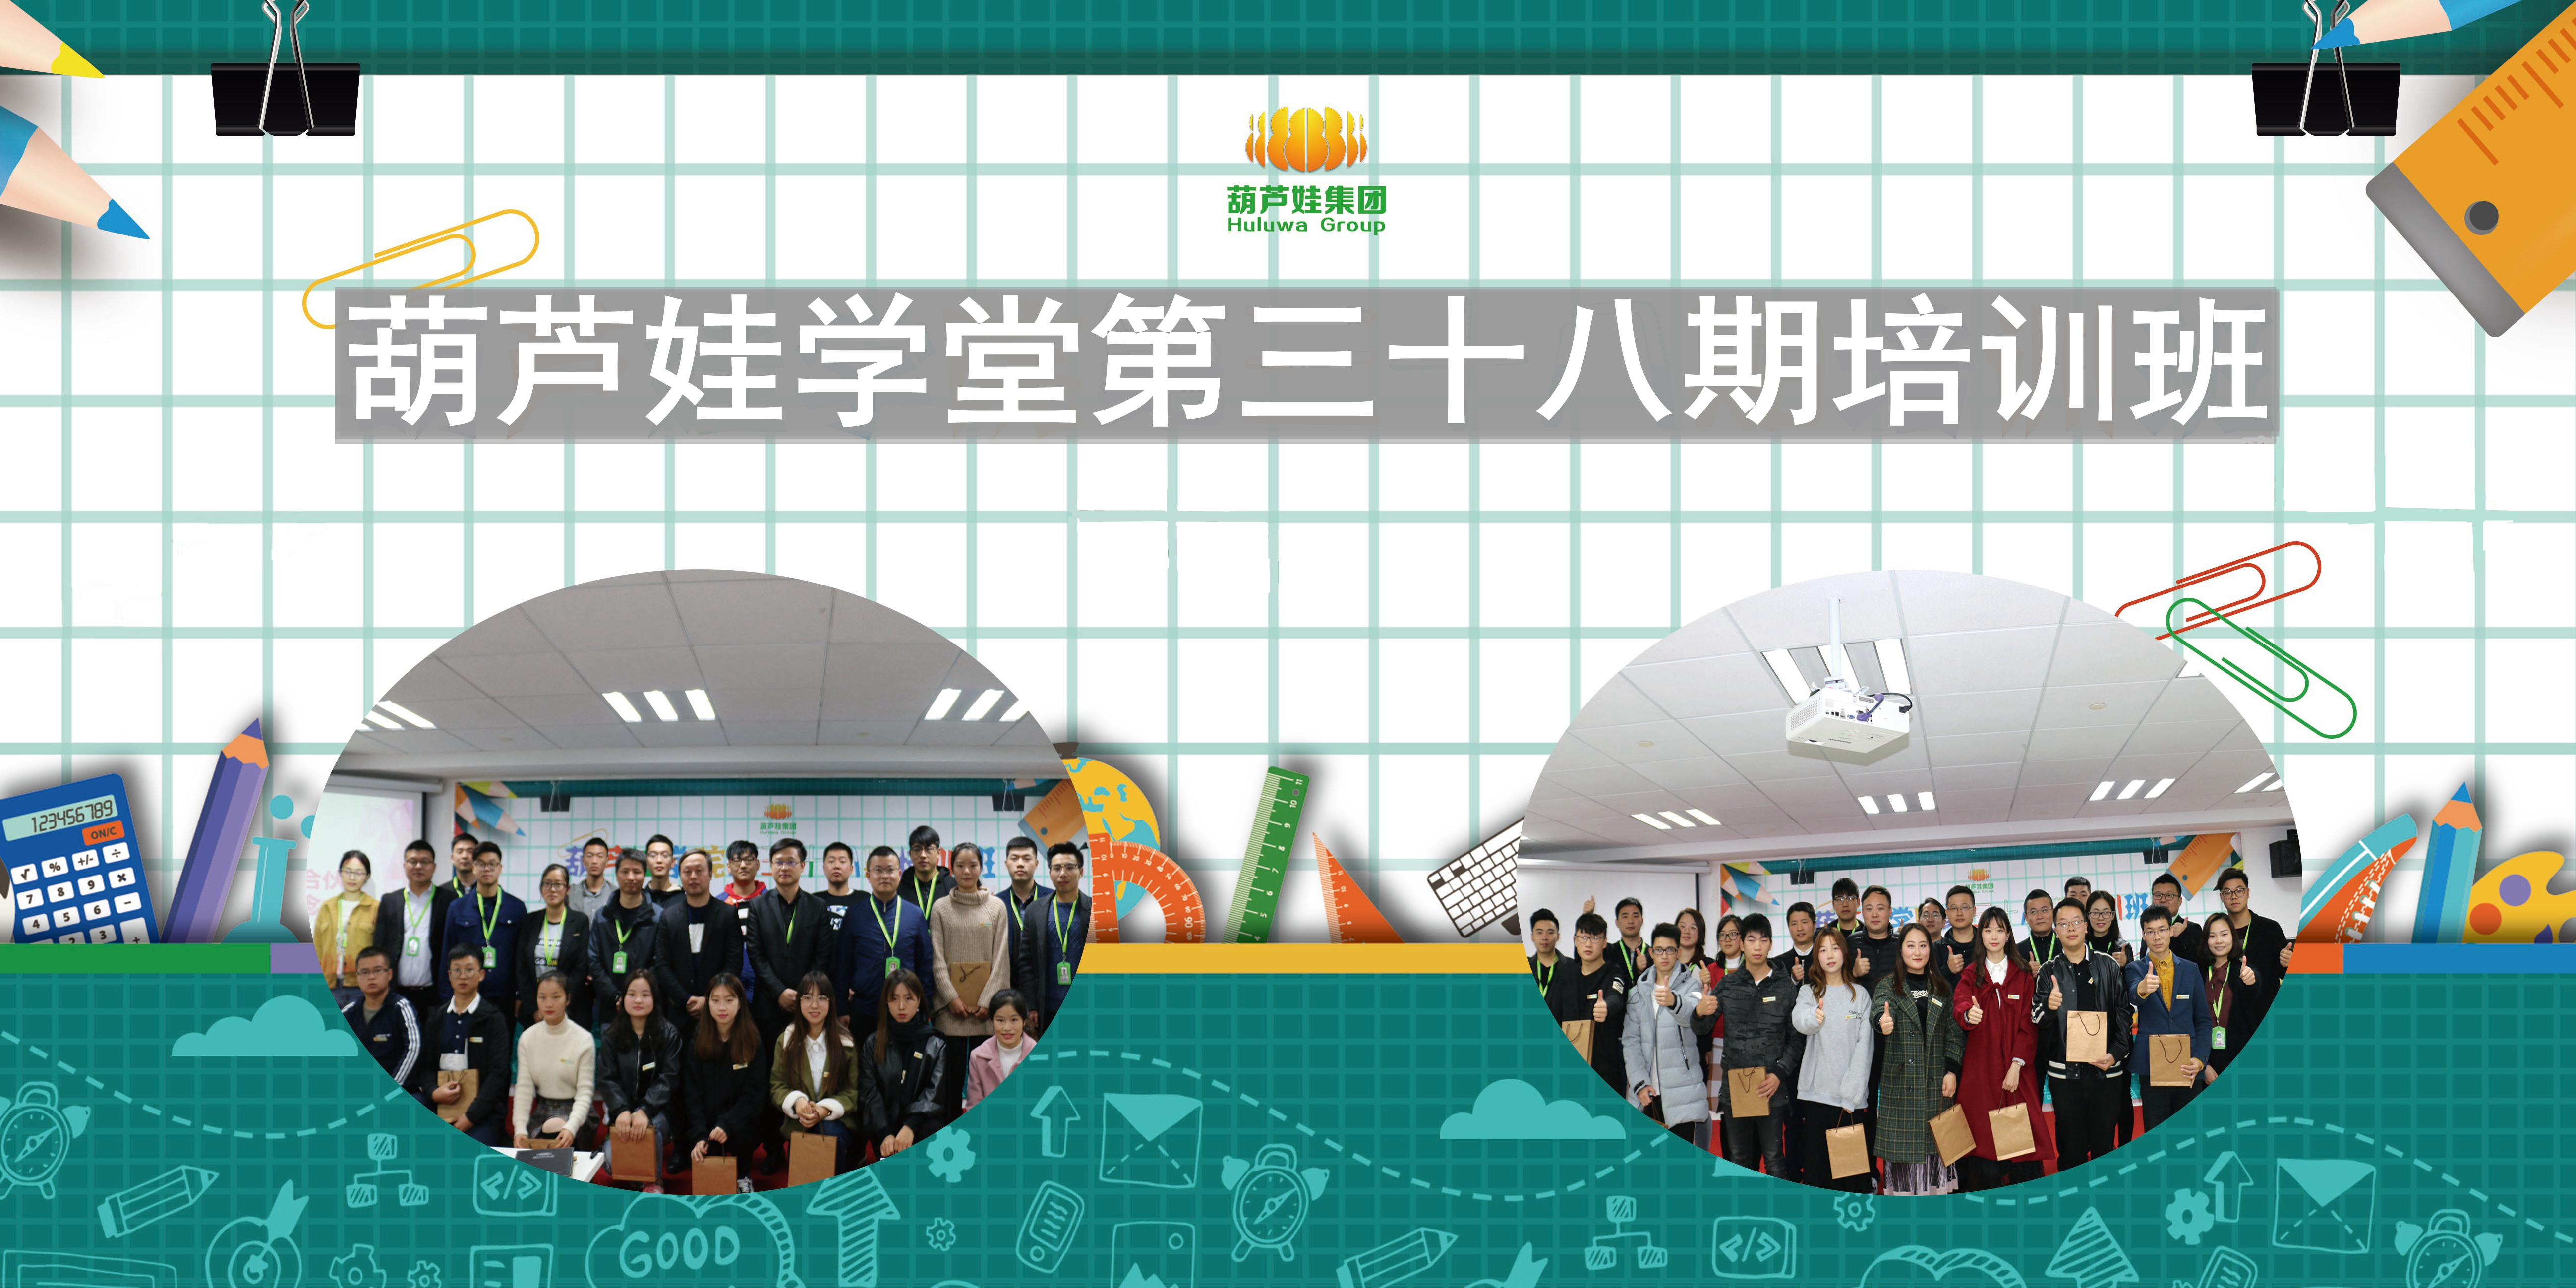 【AG8手机學院38期】五新發展新長征路,鑄造AG8手机新鐵軍